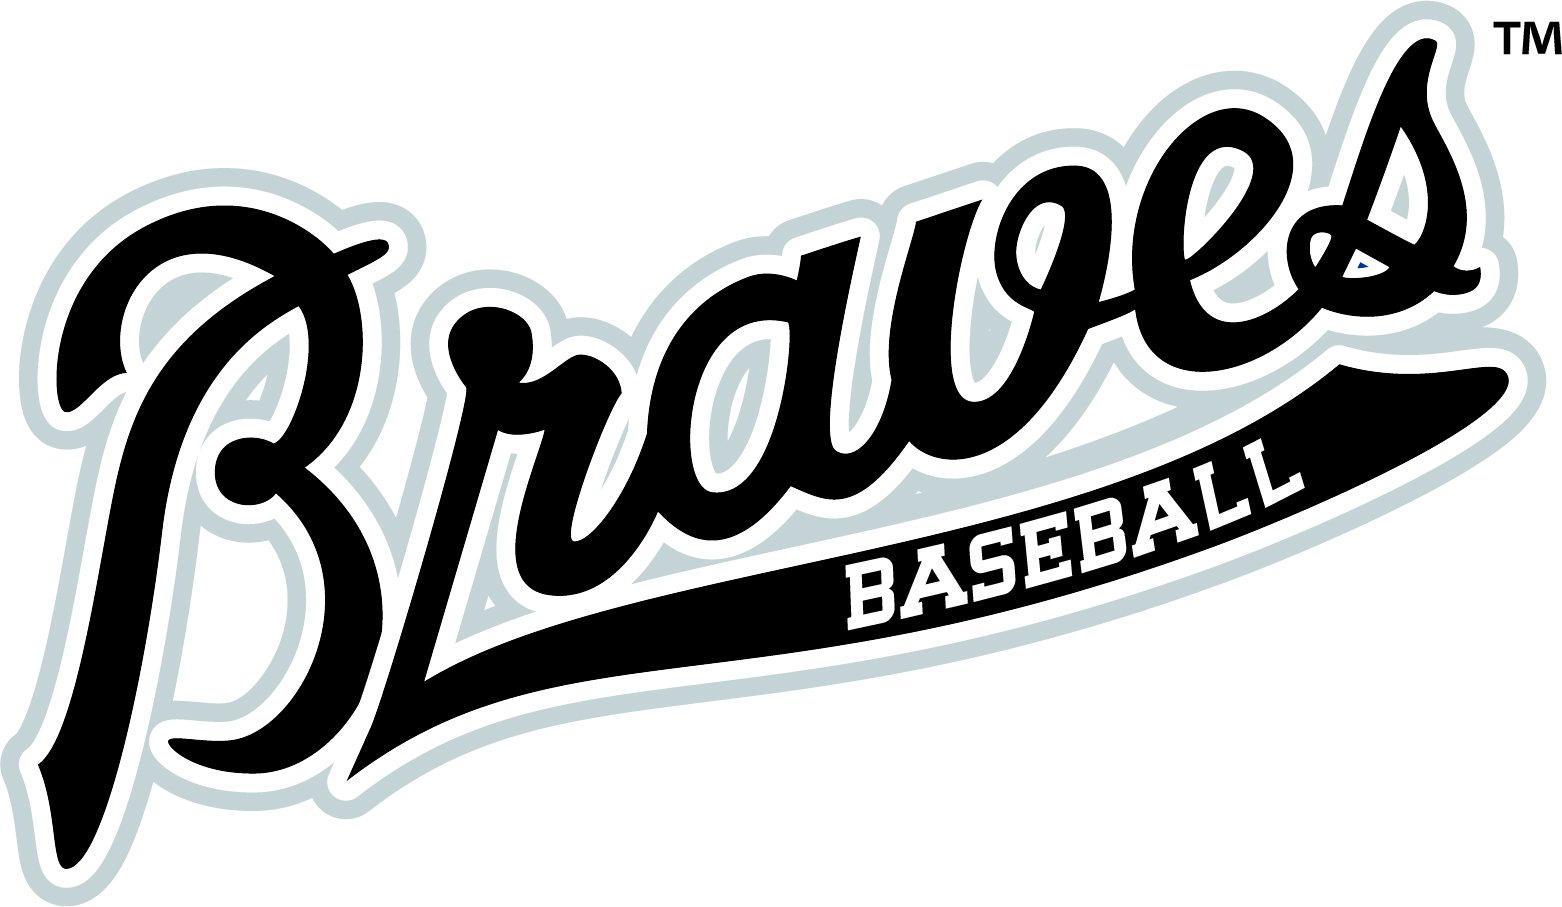 burr ridge braves atlanta braves logo font download Atlanta Braves Retro Logo